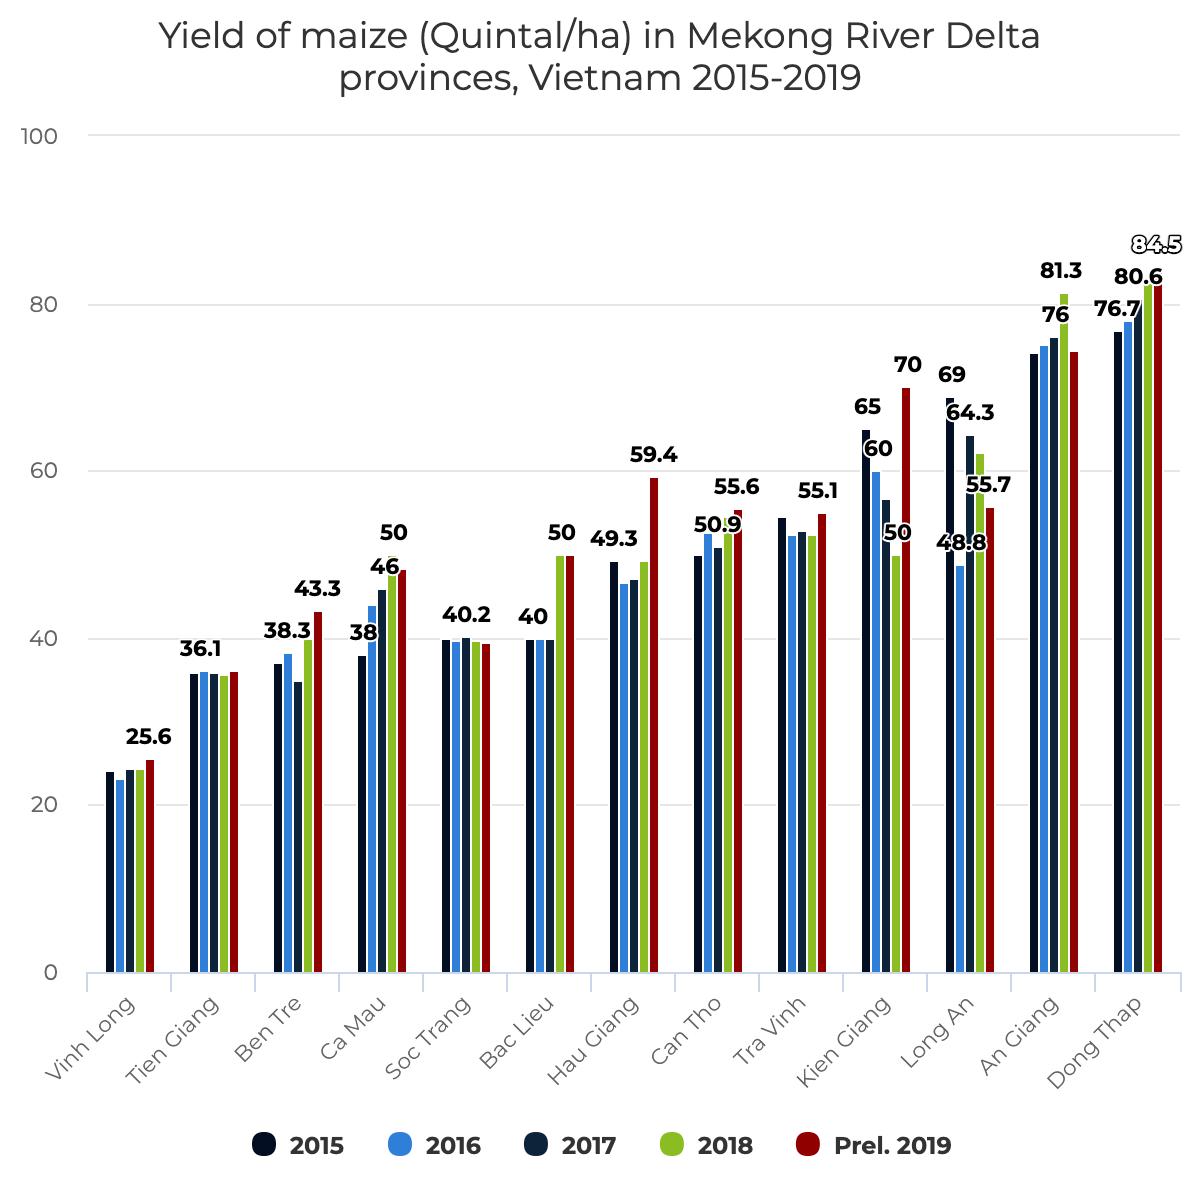 Yield of maize (Quintal/ha) in Mekong River Delta provinces provinces, Vietnam 2015-2019